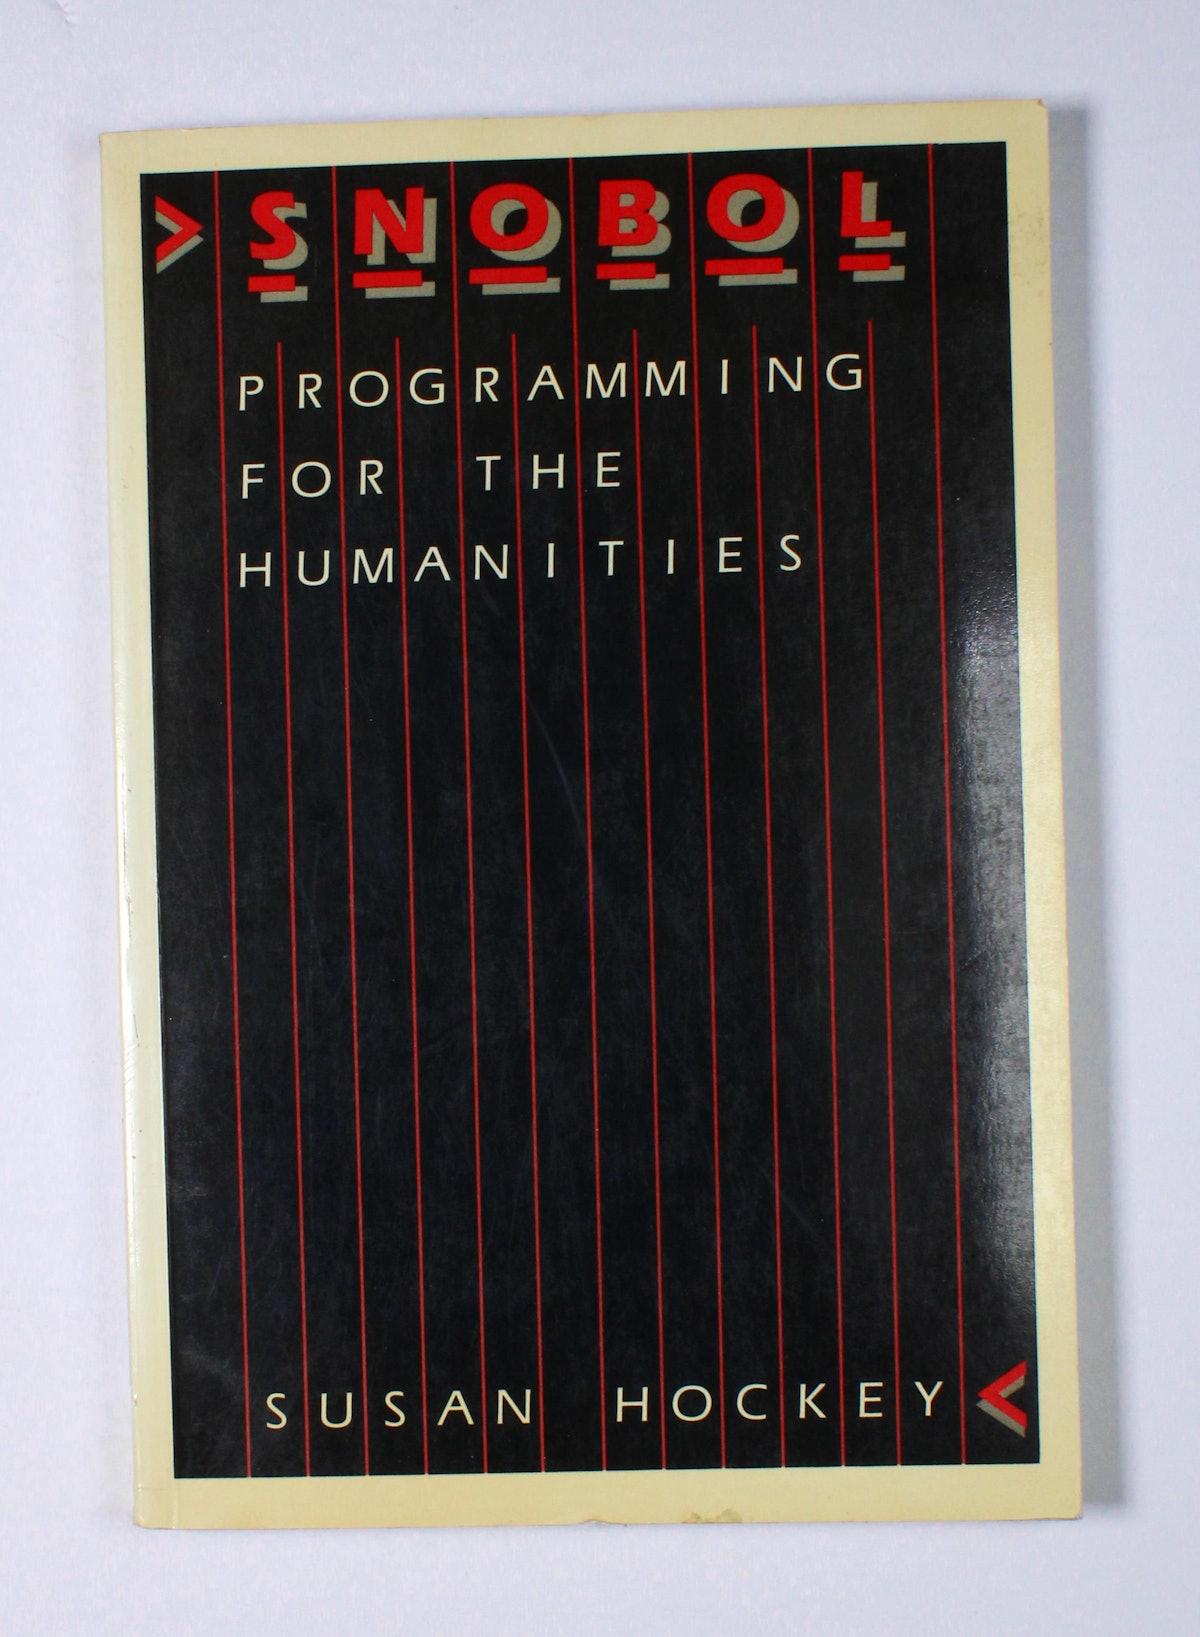 Snobol: Programming for the Humanities